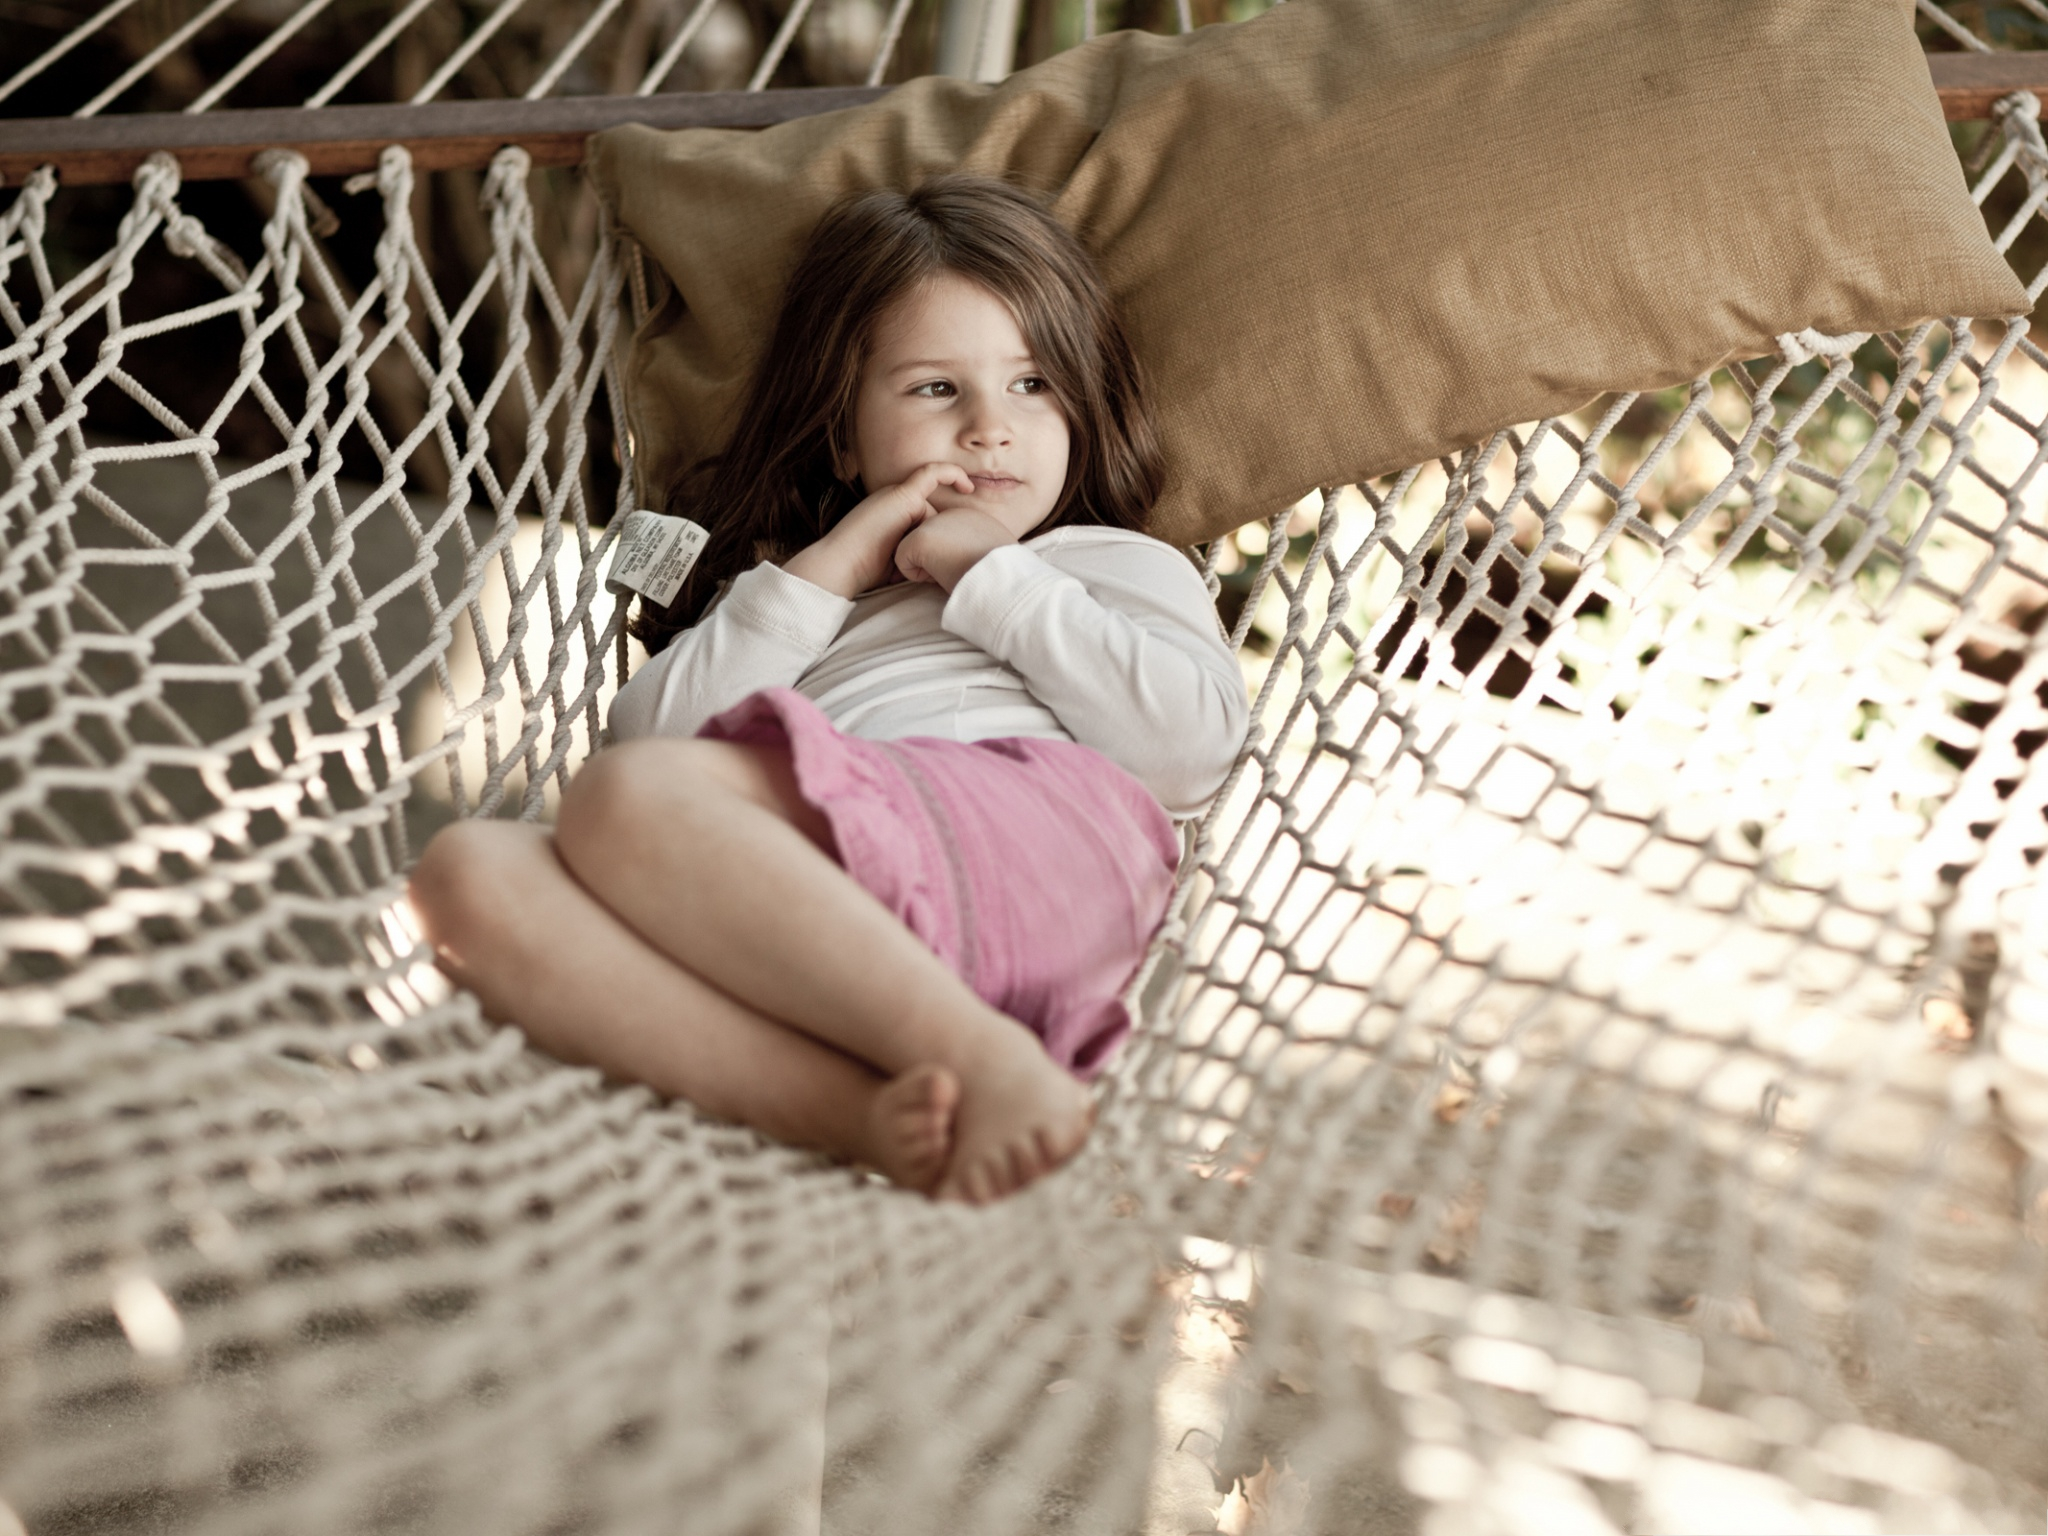 Small Cute Boy Wallpaper Little Girl Picture Baby Girl Lying On Hammock